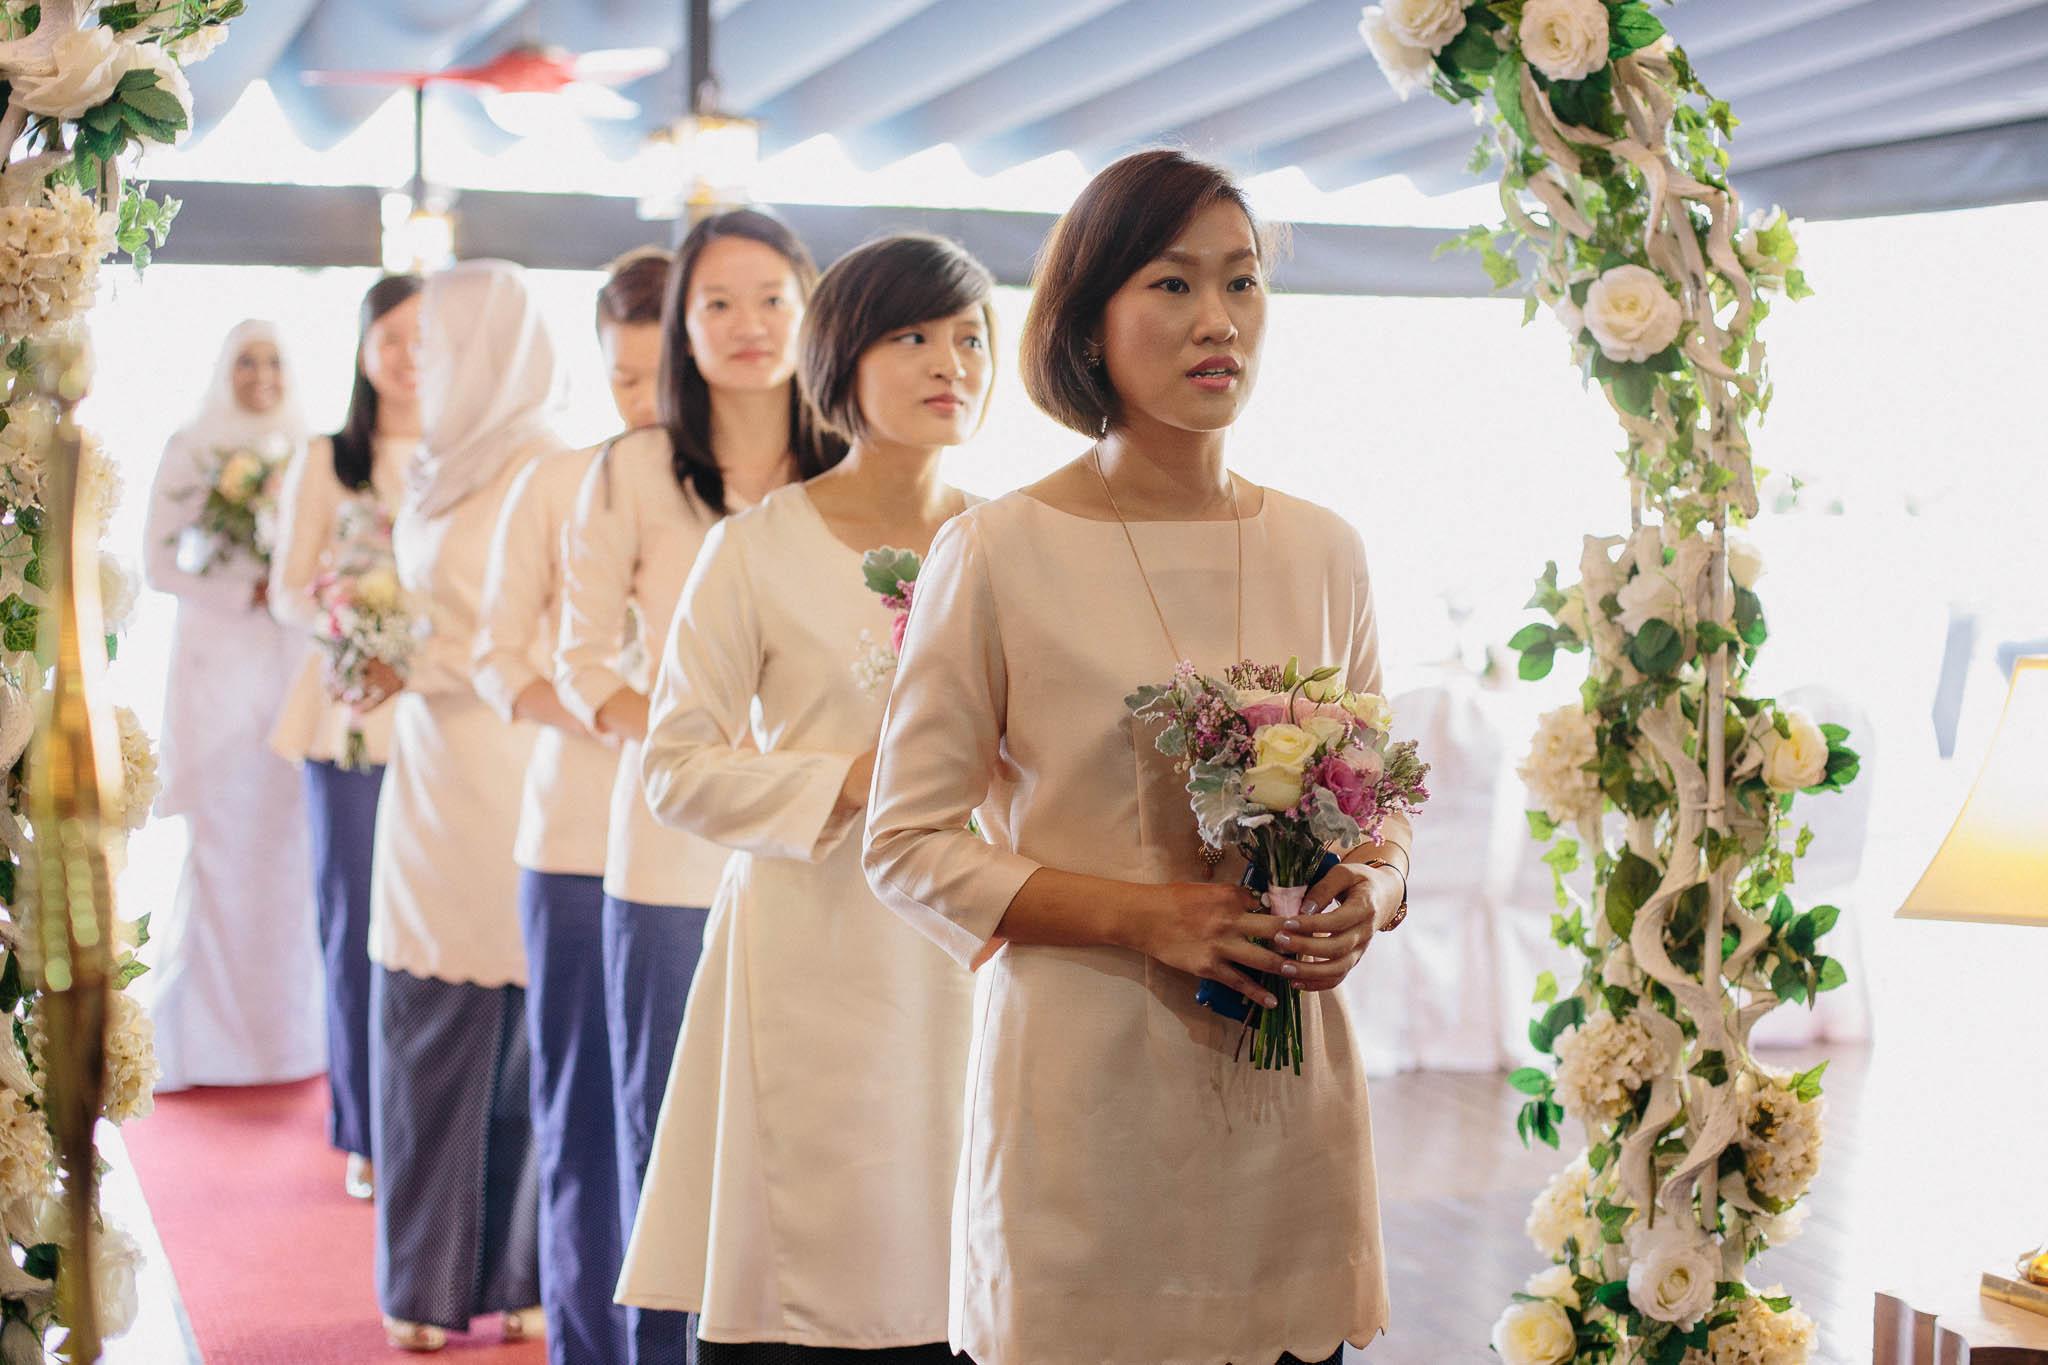 singapore-wedding-photographer-malay-indian-pre-wedding-travel-wmt-2015-shereen-farid-22.jpg